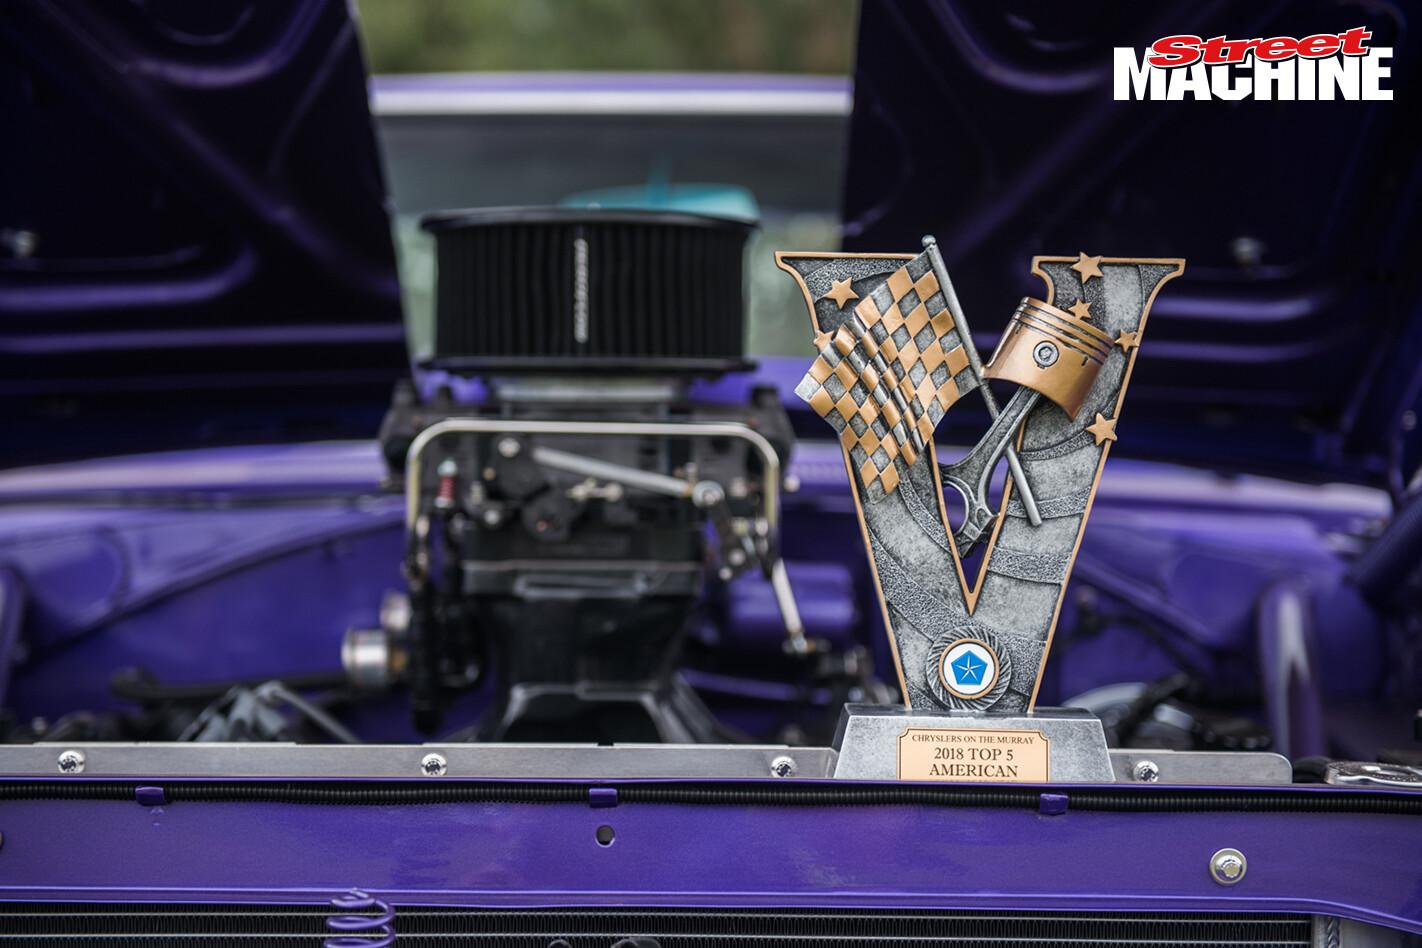 Plymouth GTX Engine Trophy Nw Jpg